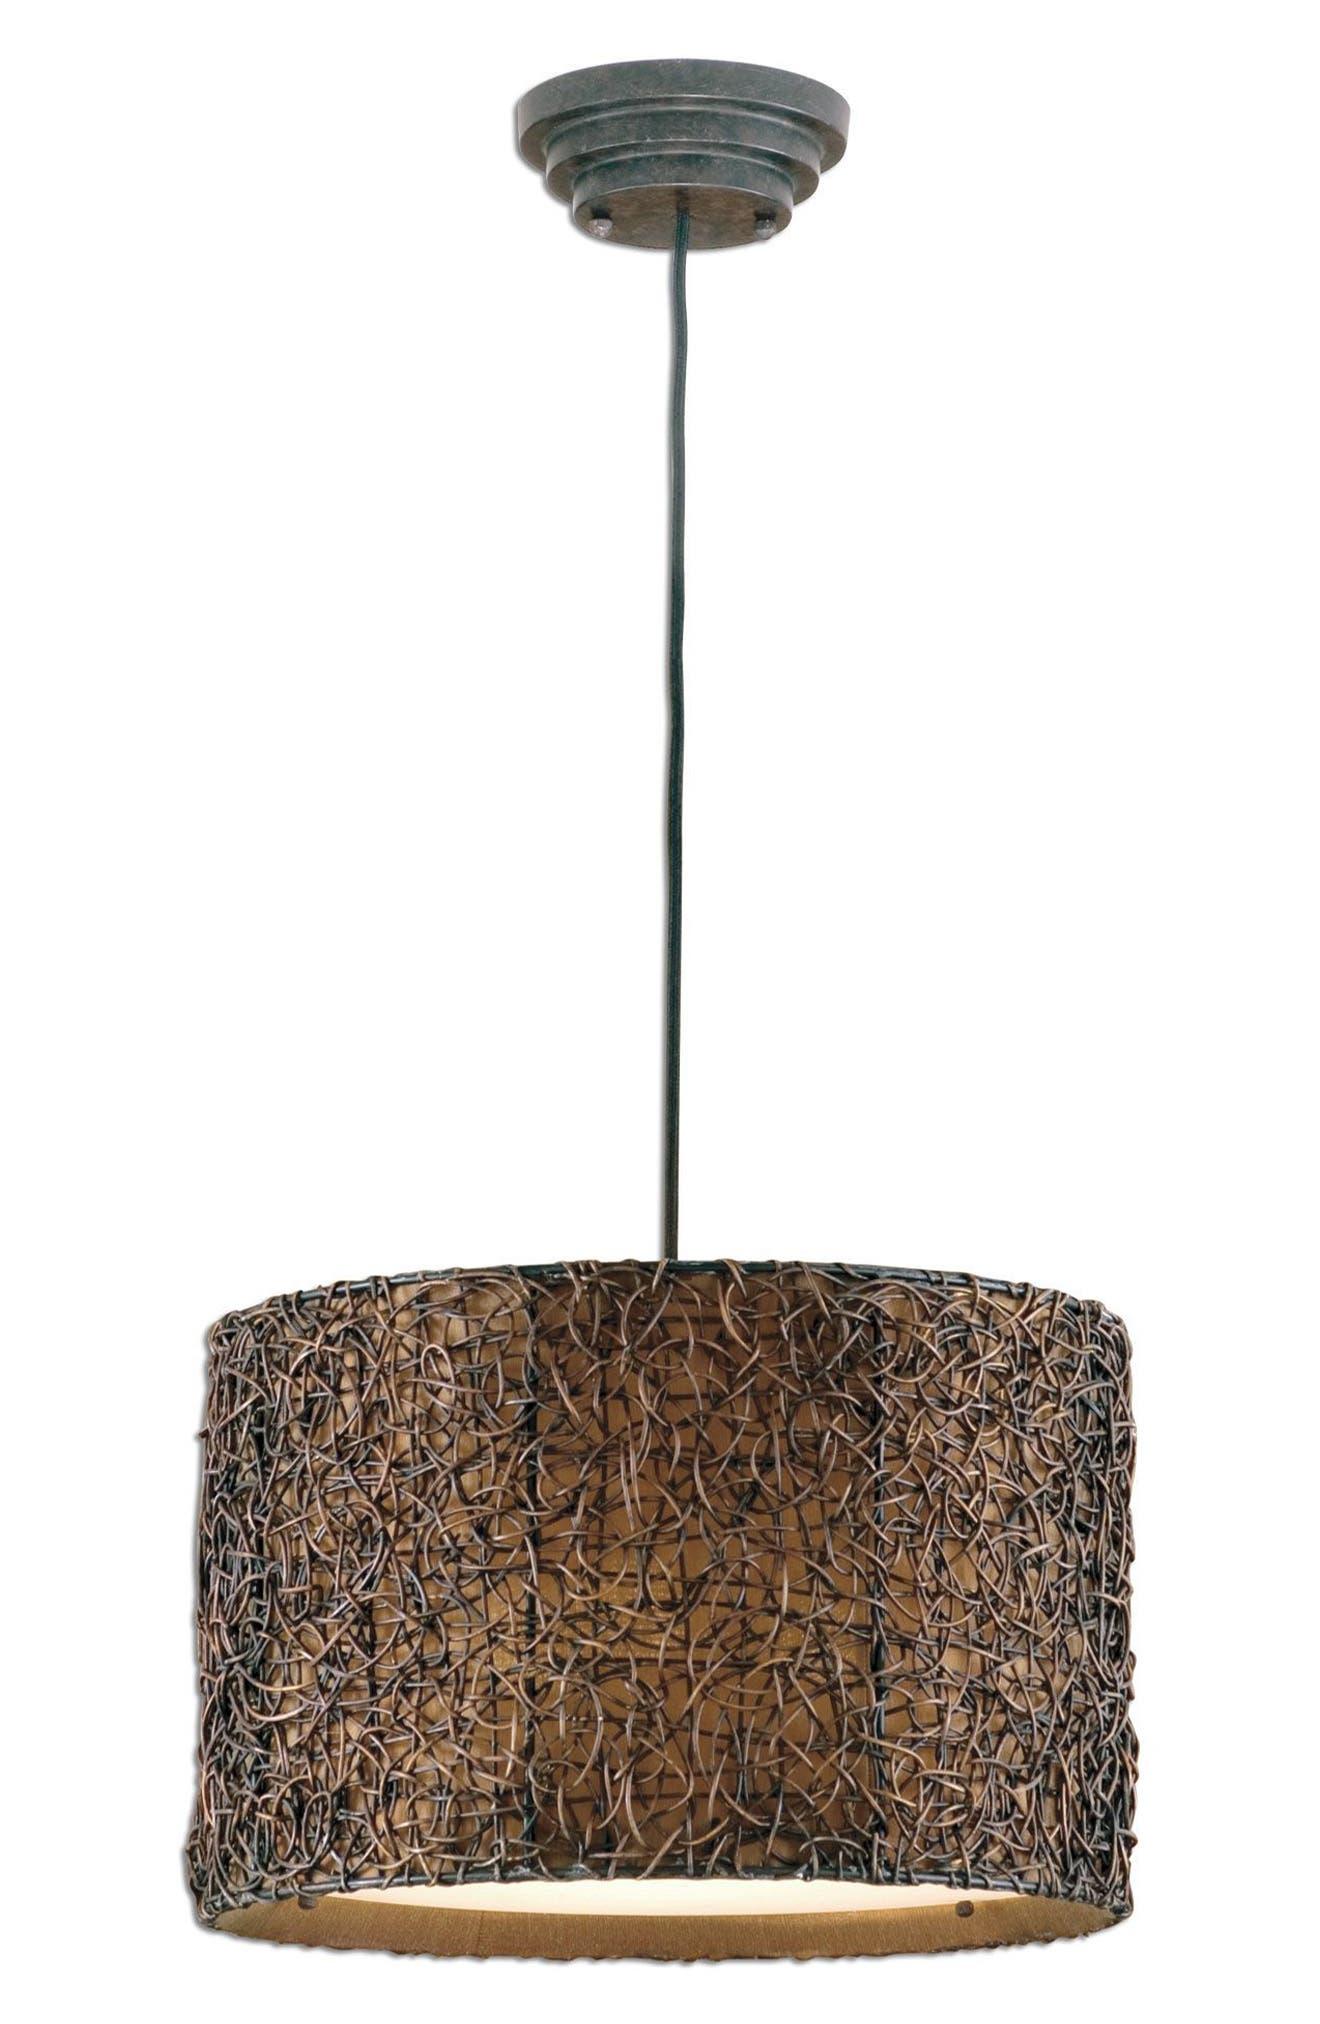 Knotted Rattan Pendant Lamp,                         Main,                         color, Metallic Rust/ Copper